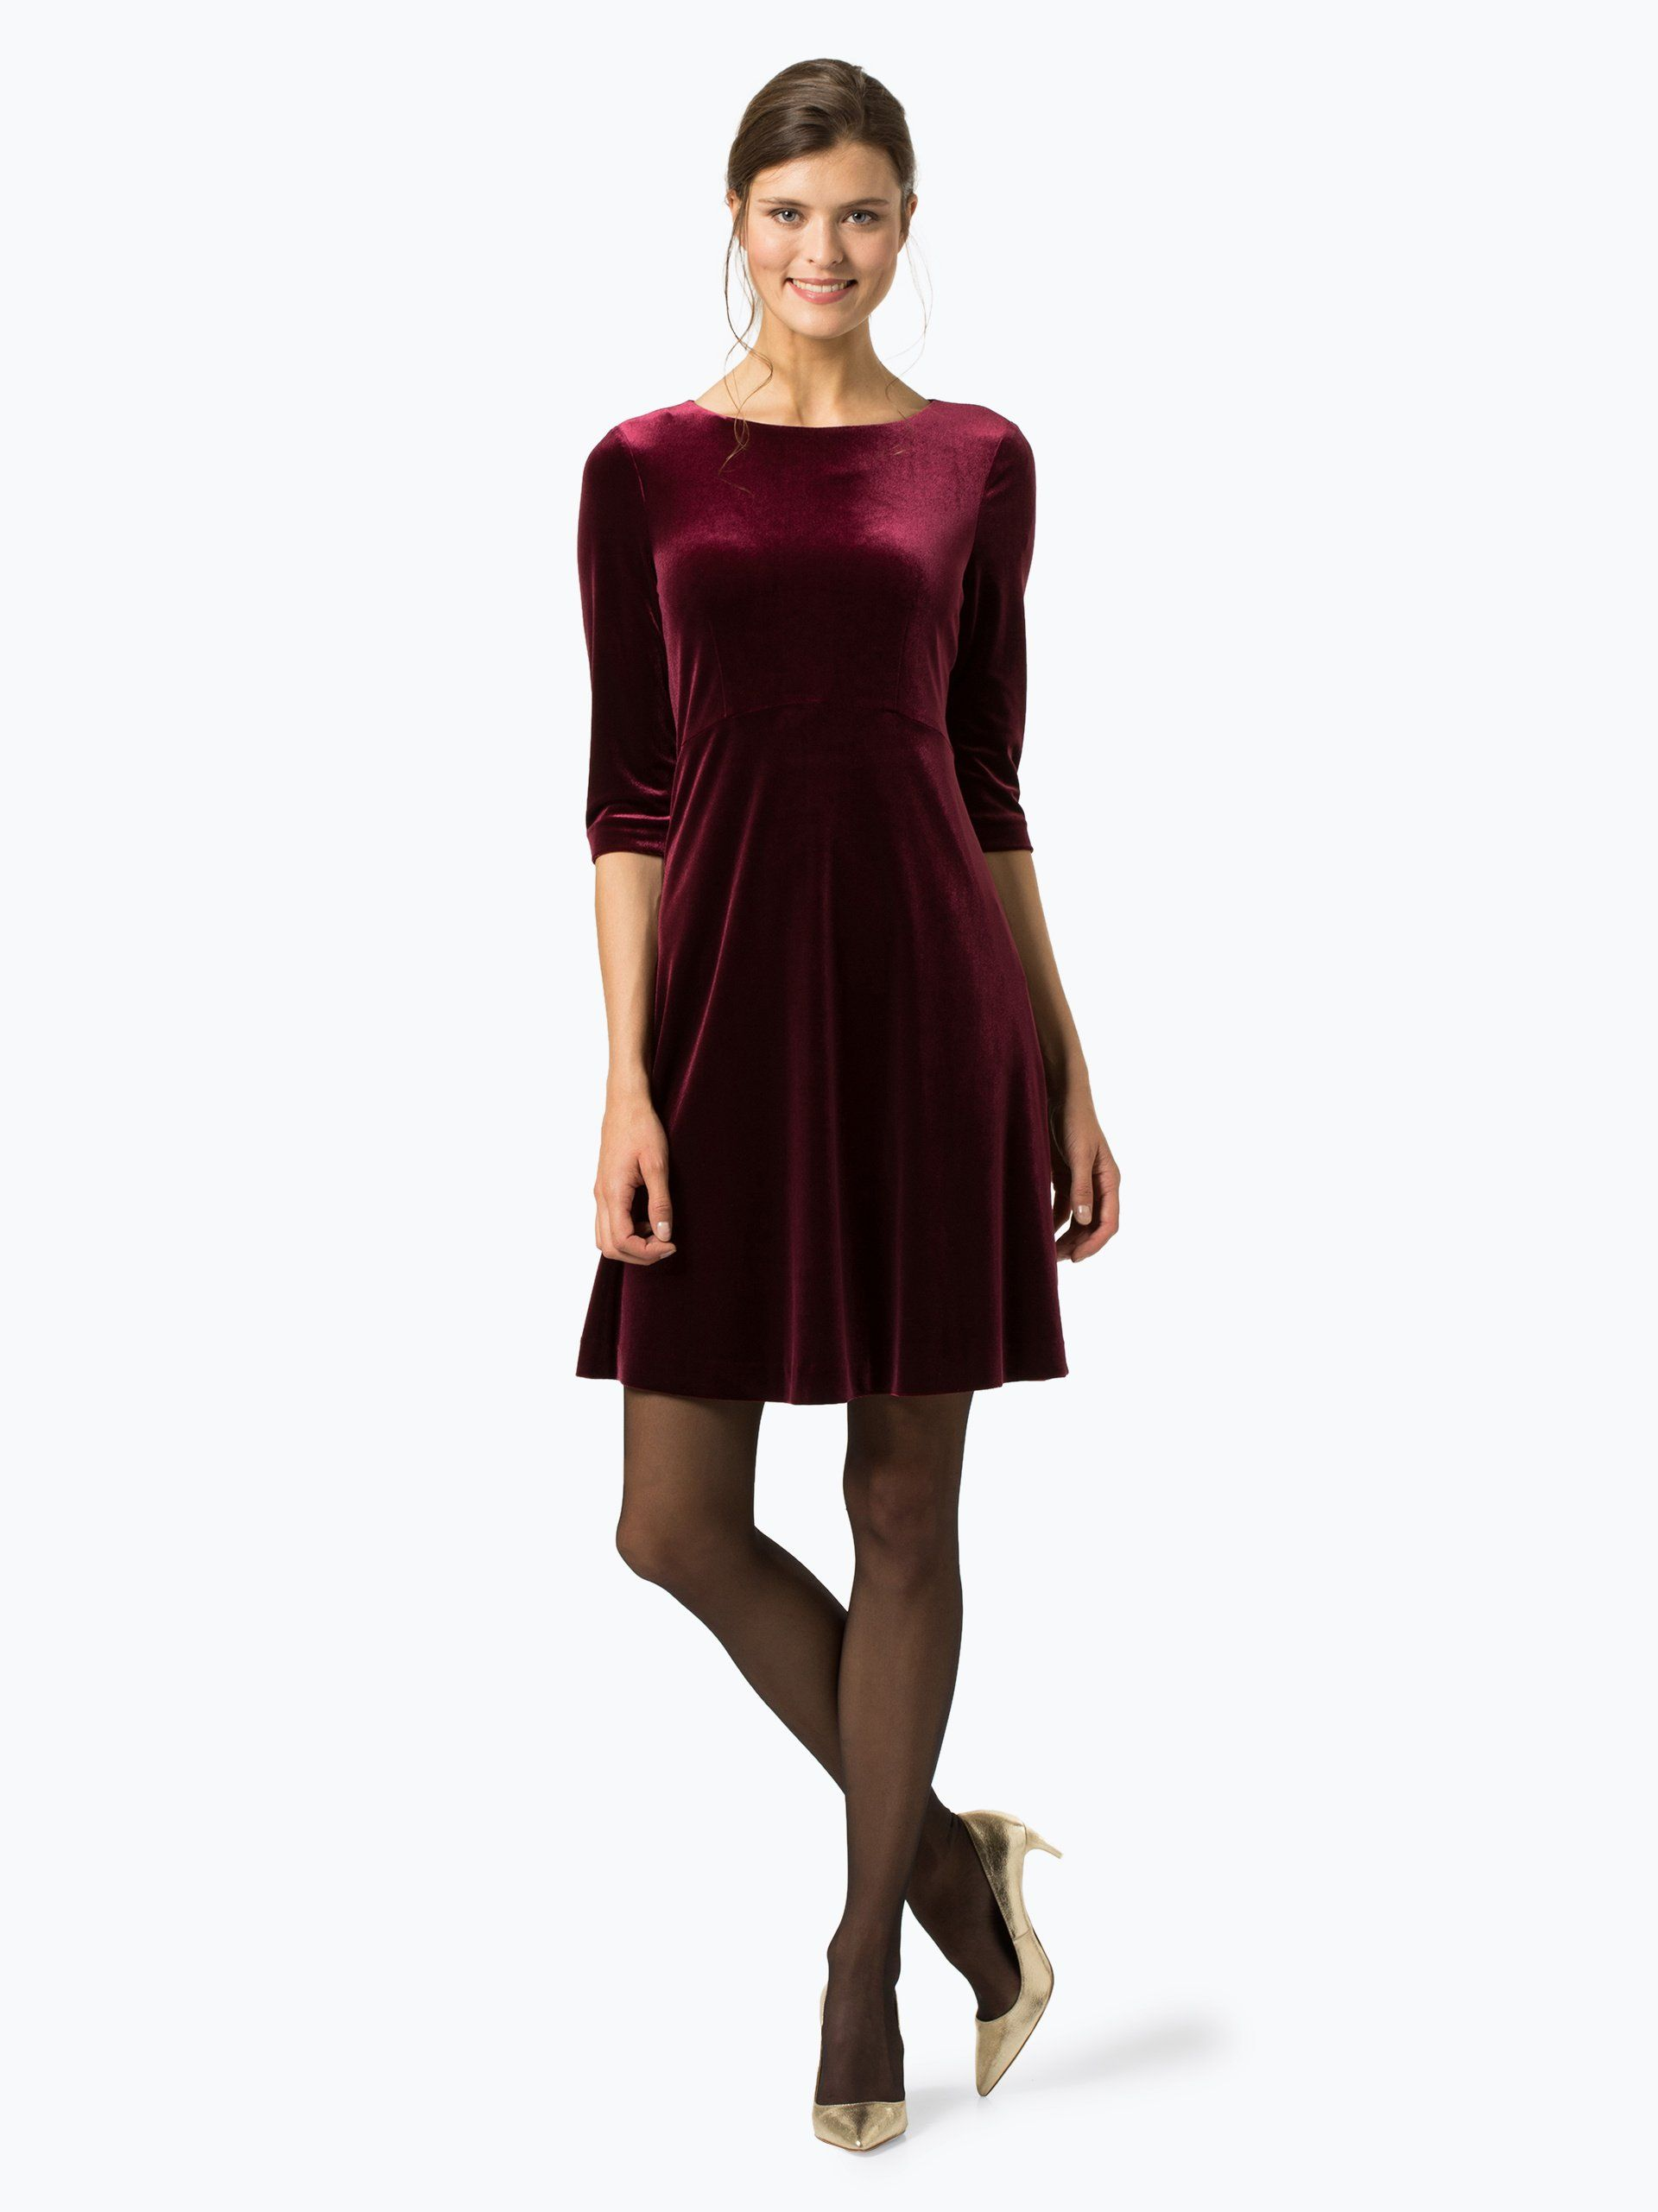 Ambiance Sukienka damska kup online  VANGRAAF.COM  Fashion